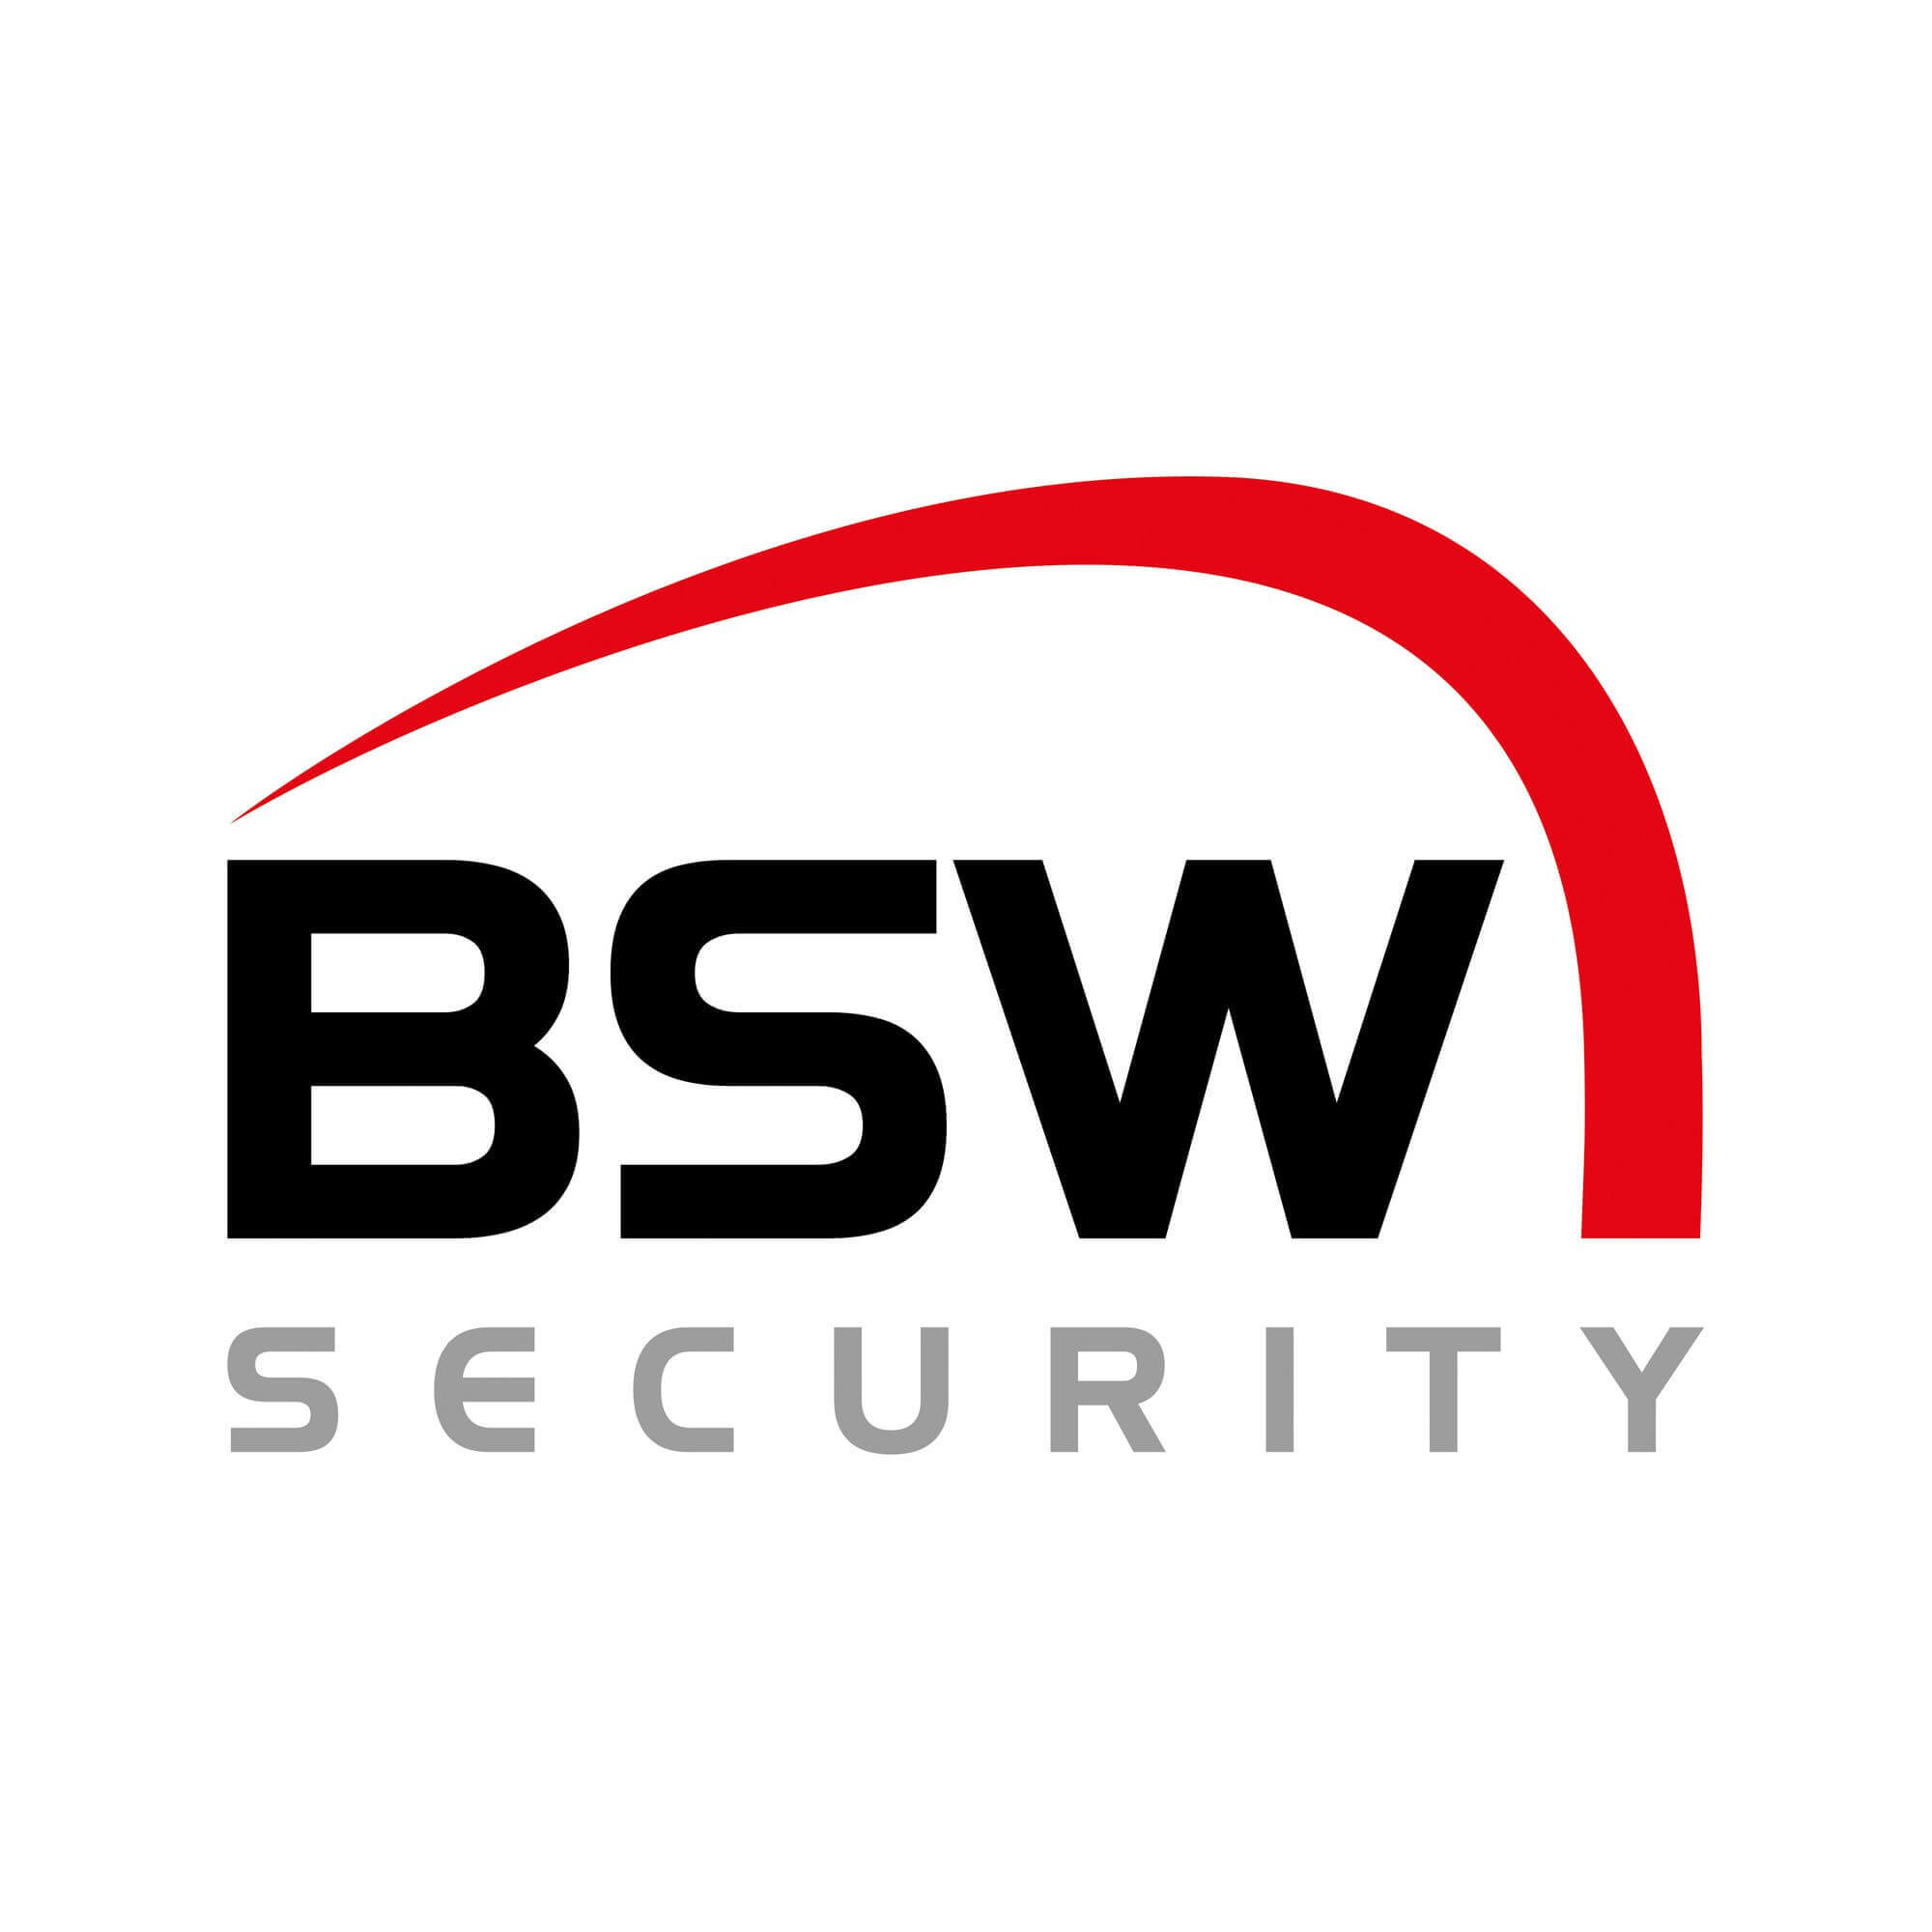 Bsw Security